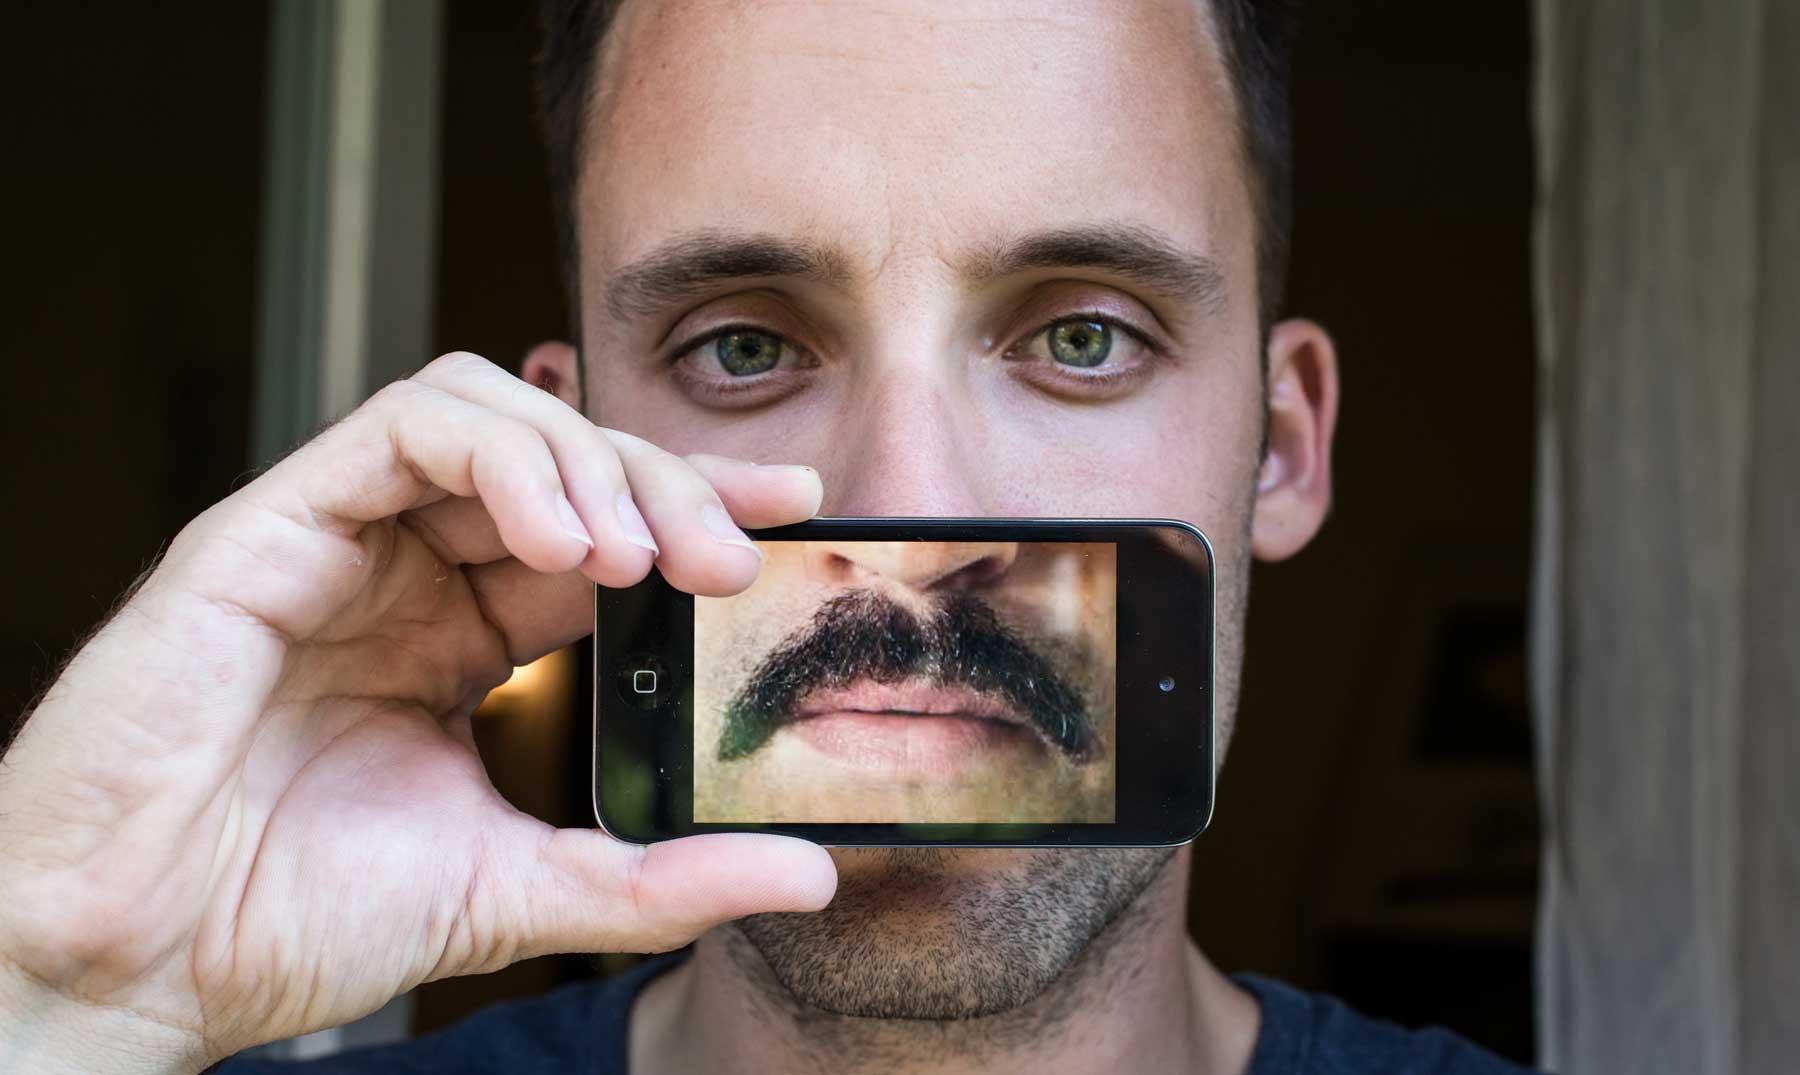 Llevar bigote puede ser peligroso